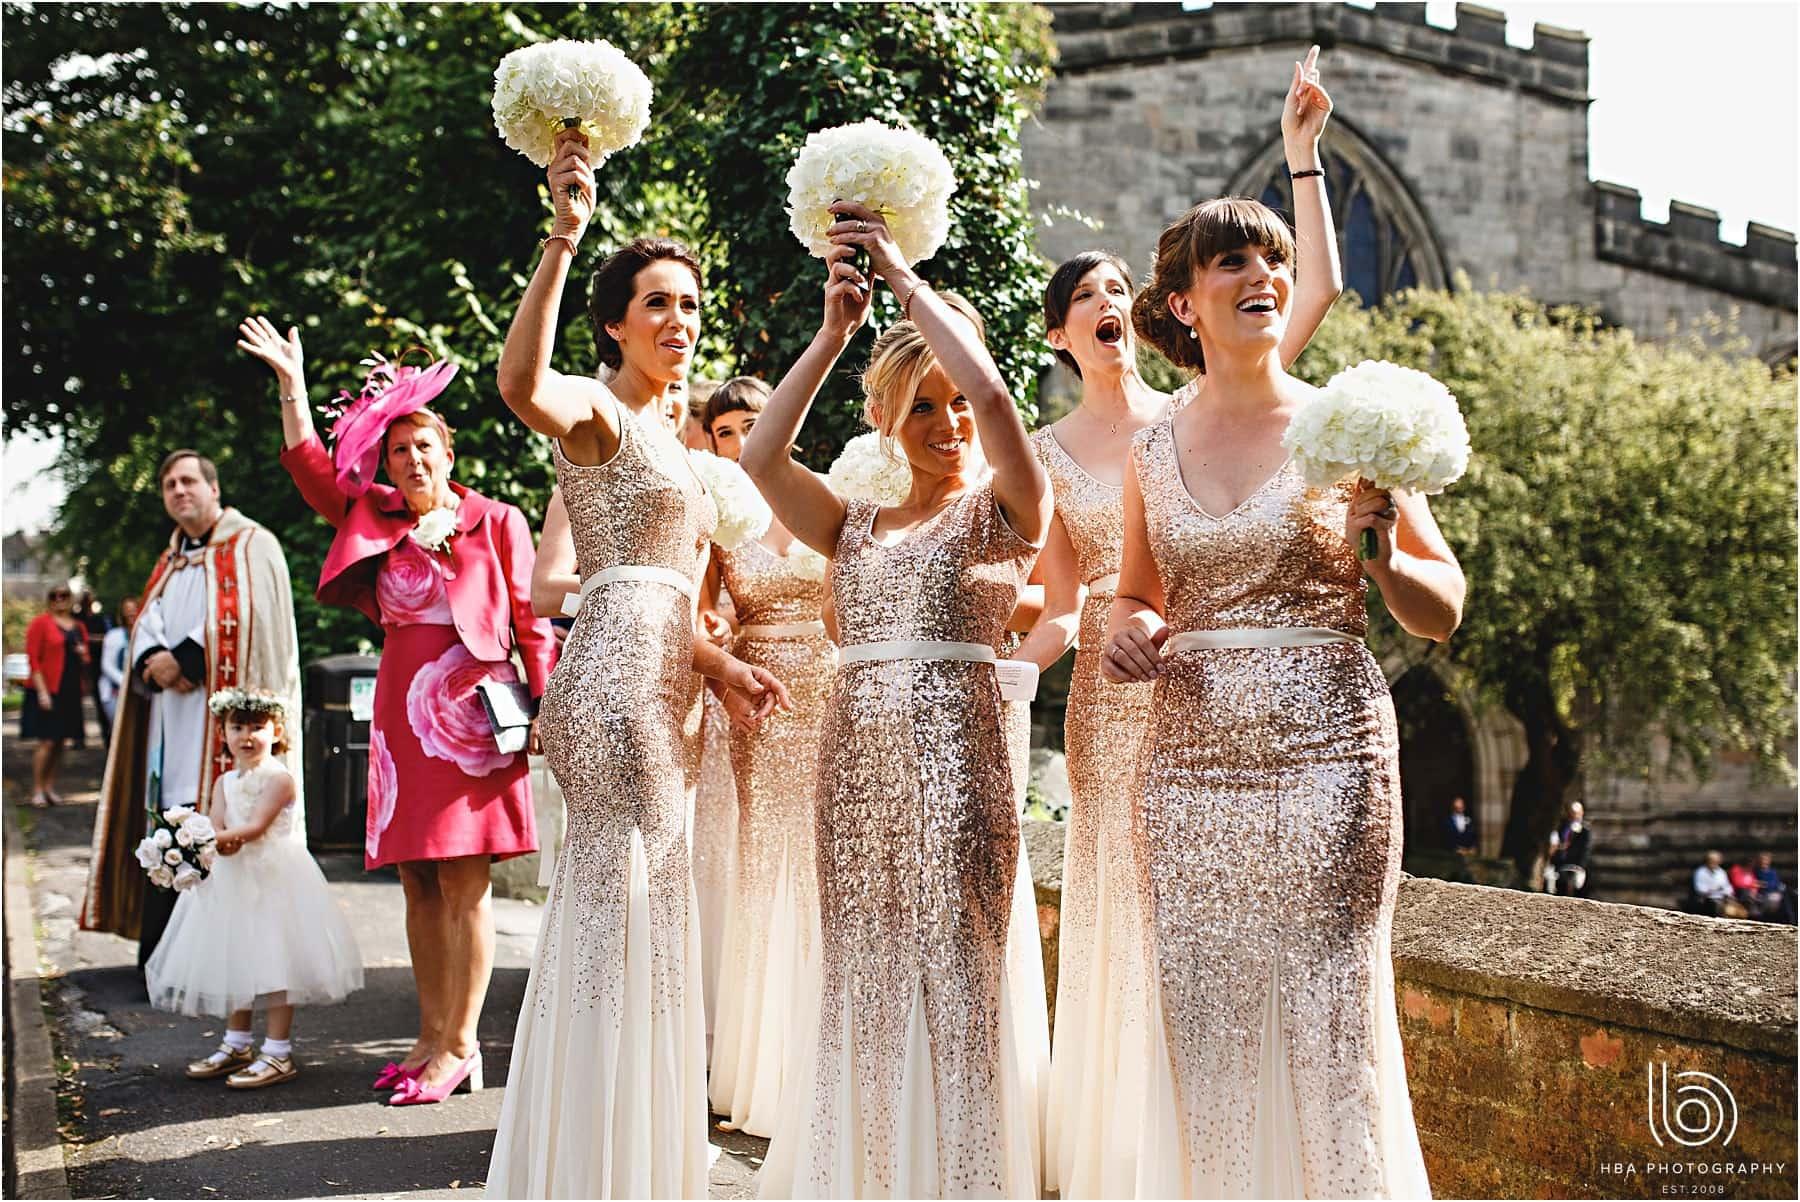 the bridesmaids cheering